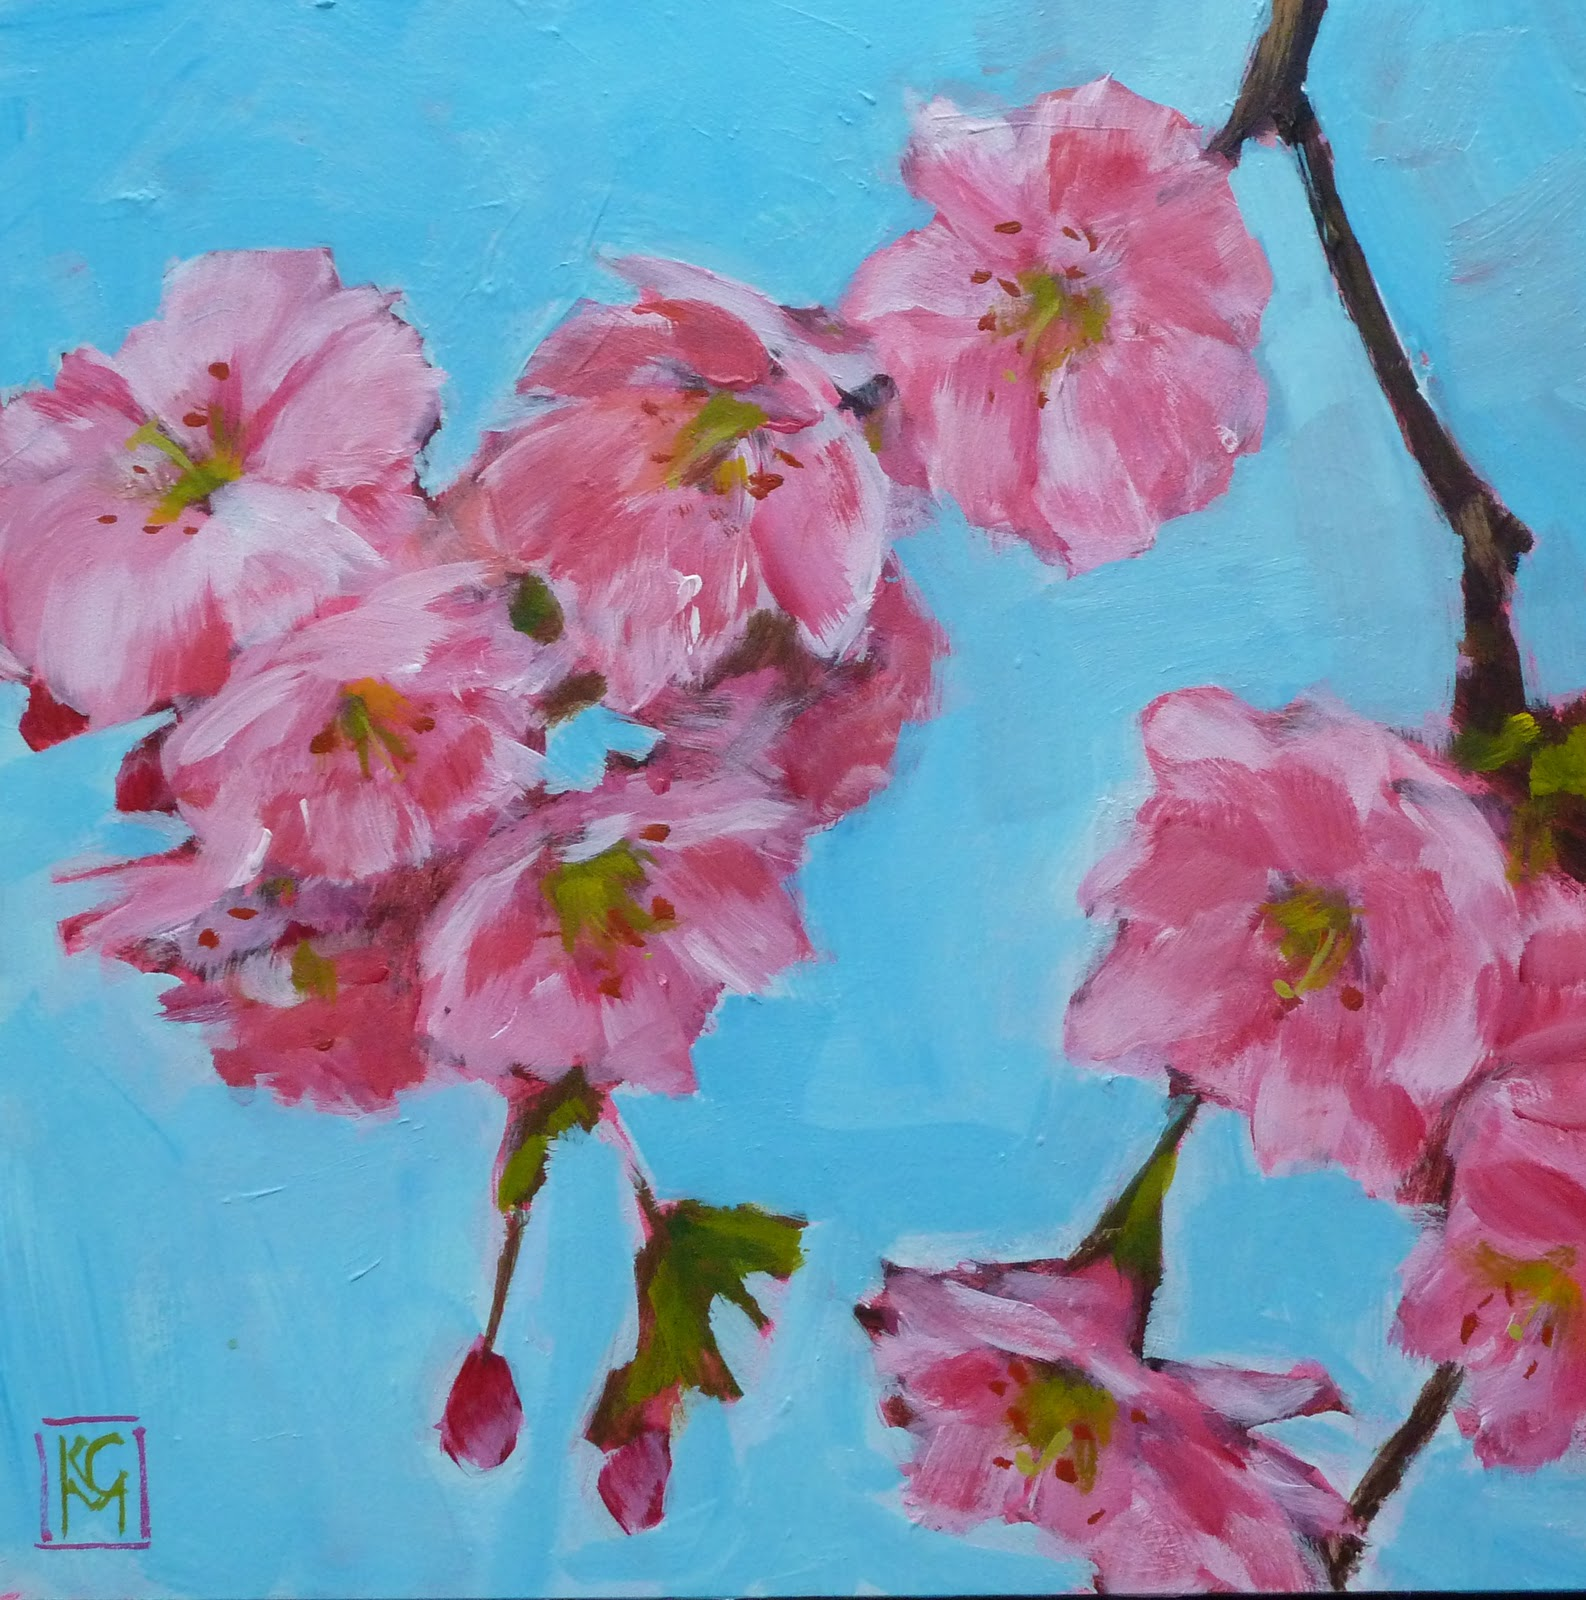 kelley macdonald 39 s paintings cherry blossoms 8x8 acrylic